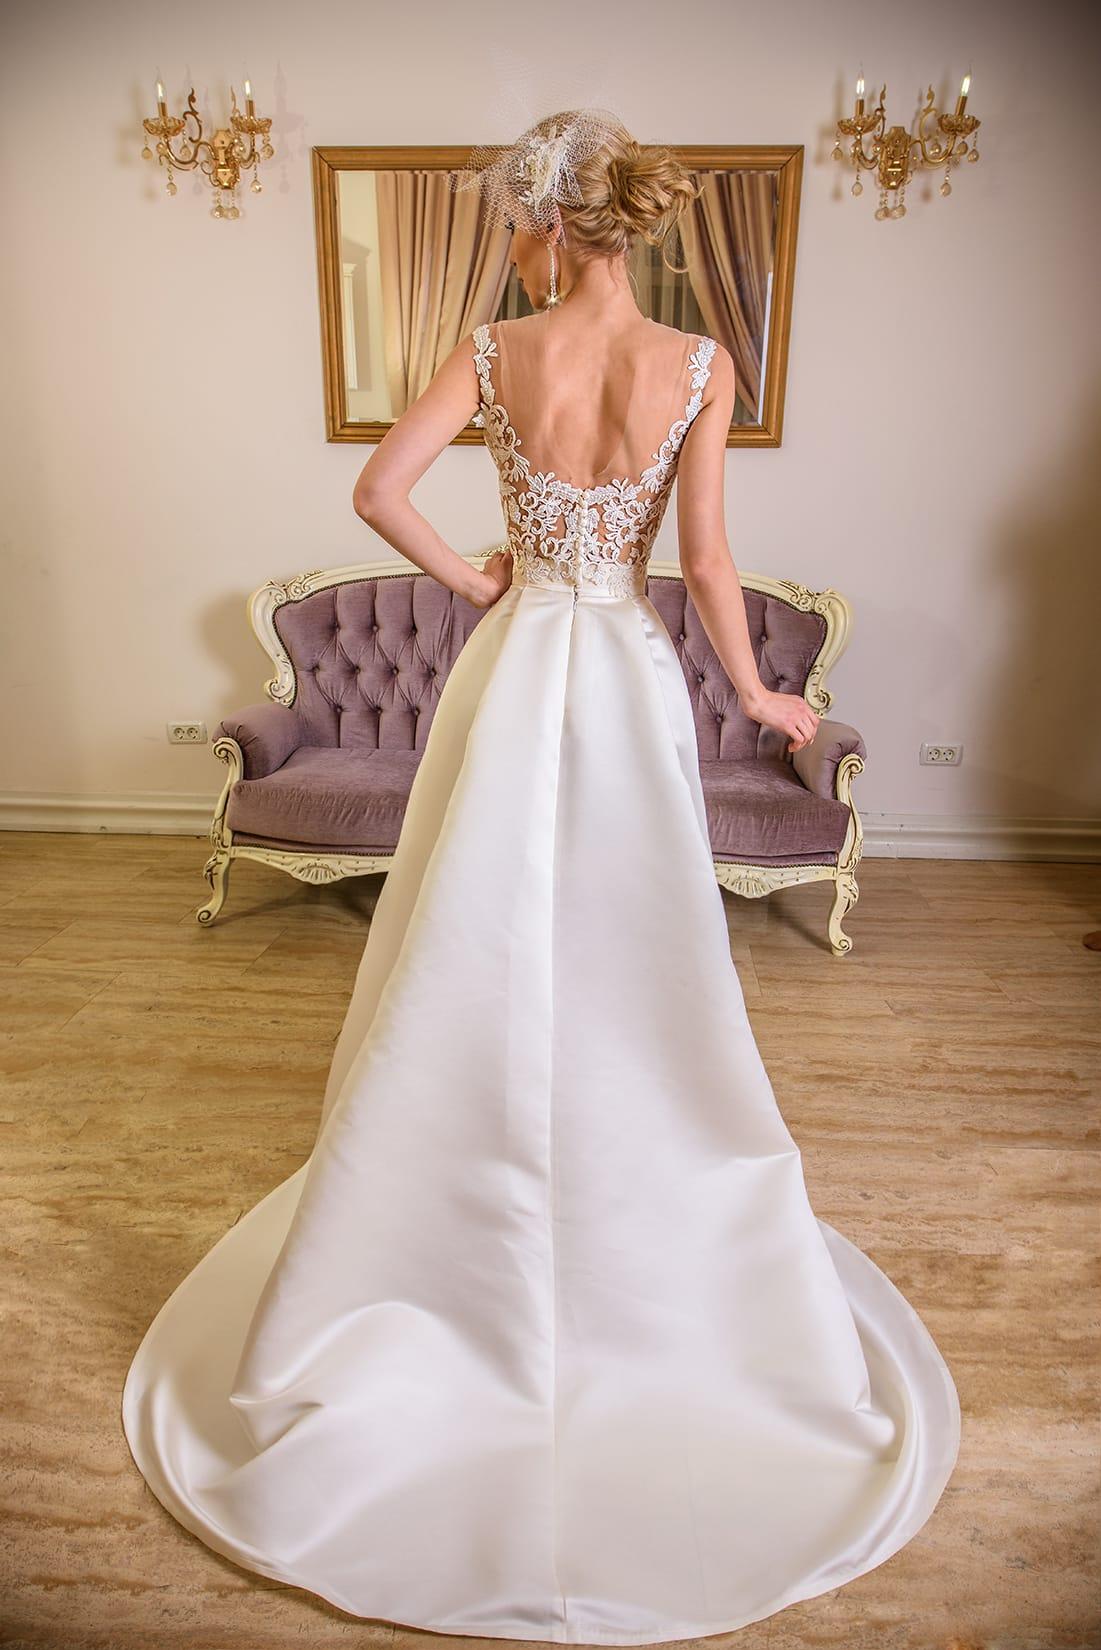 Nina Model - Colectia Baroque - Adora Sposa (2)